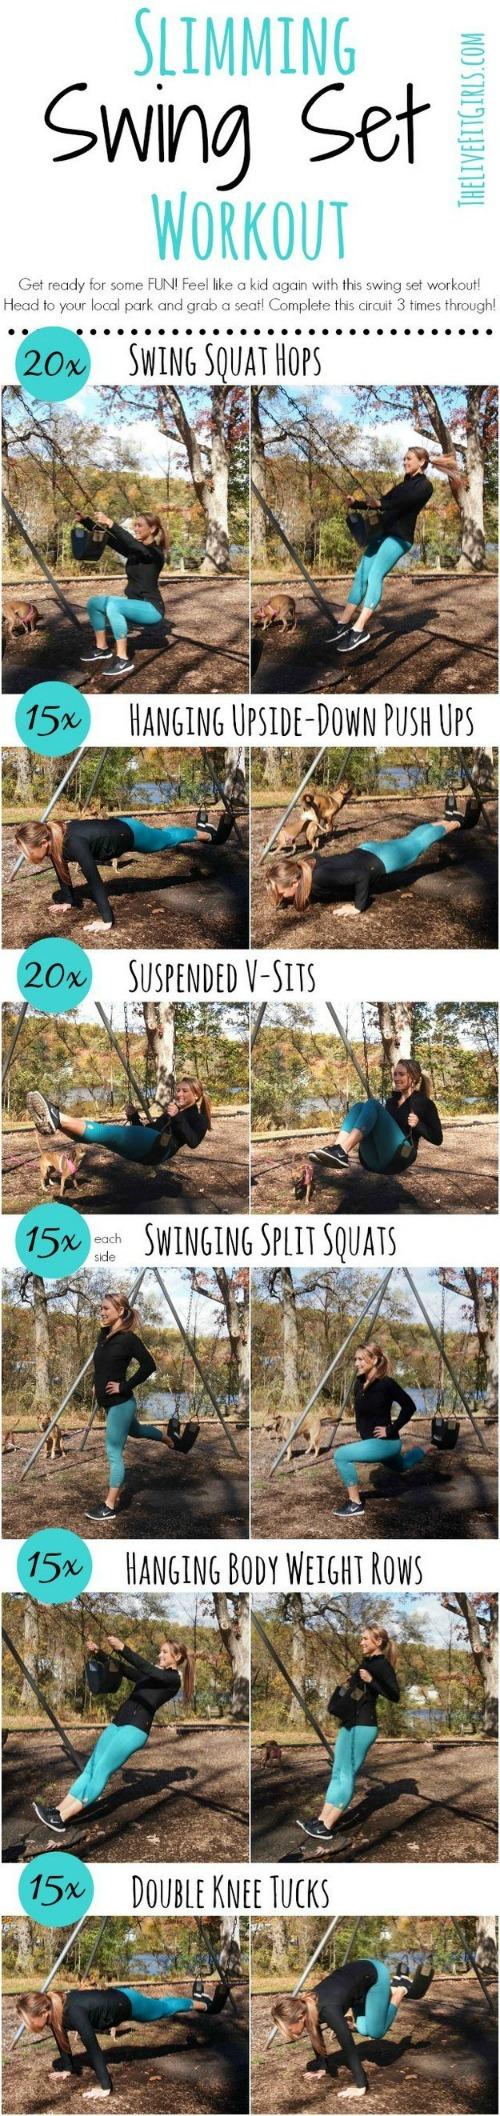 swing-set-workout